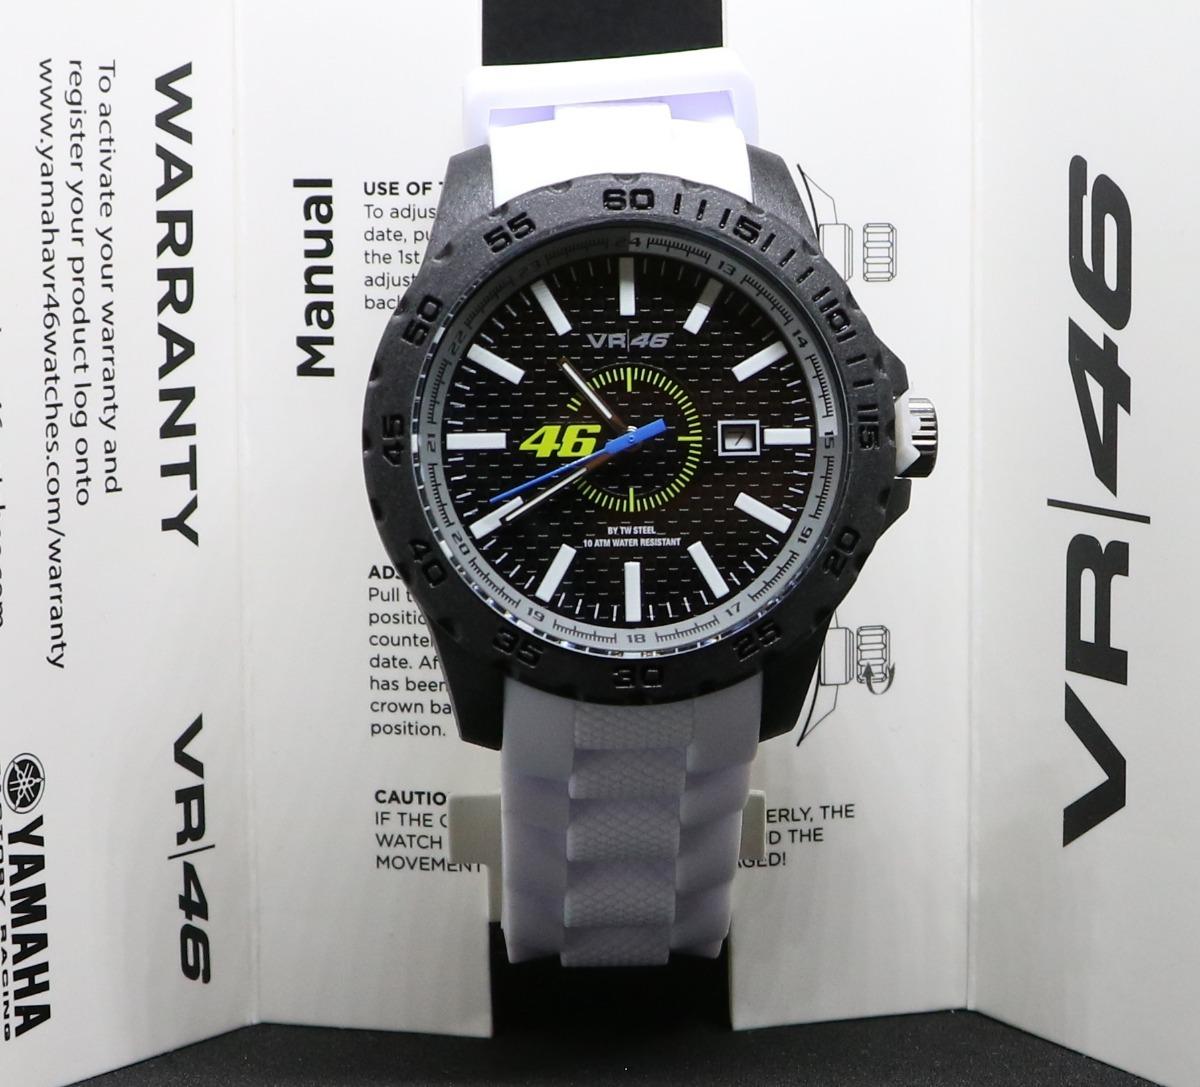 Y Yamaha Vr46 40 WatchoutReloj Tw Vr4 Serie Steel 45mm dCxBoer